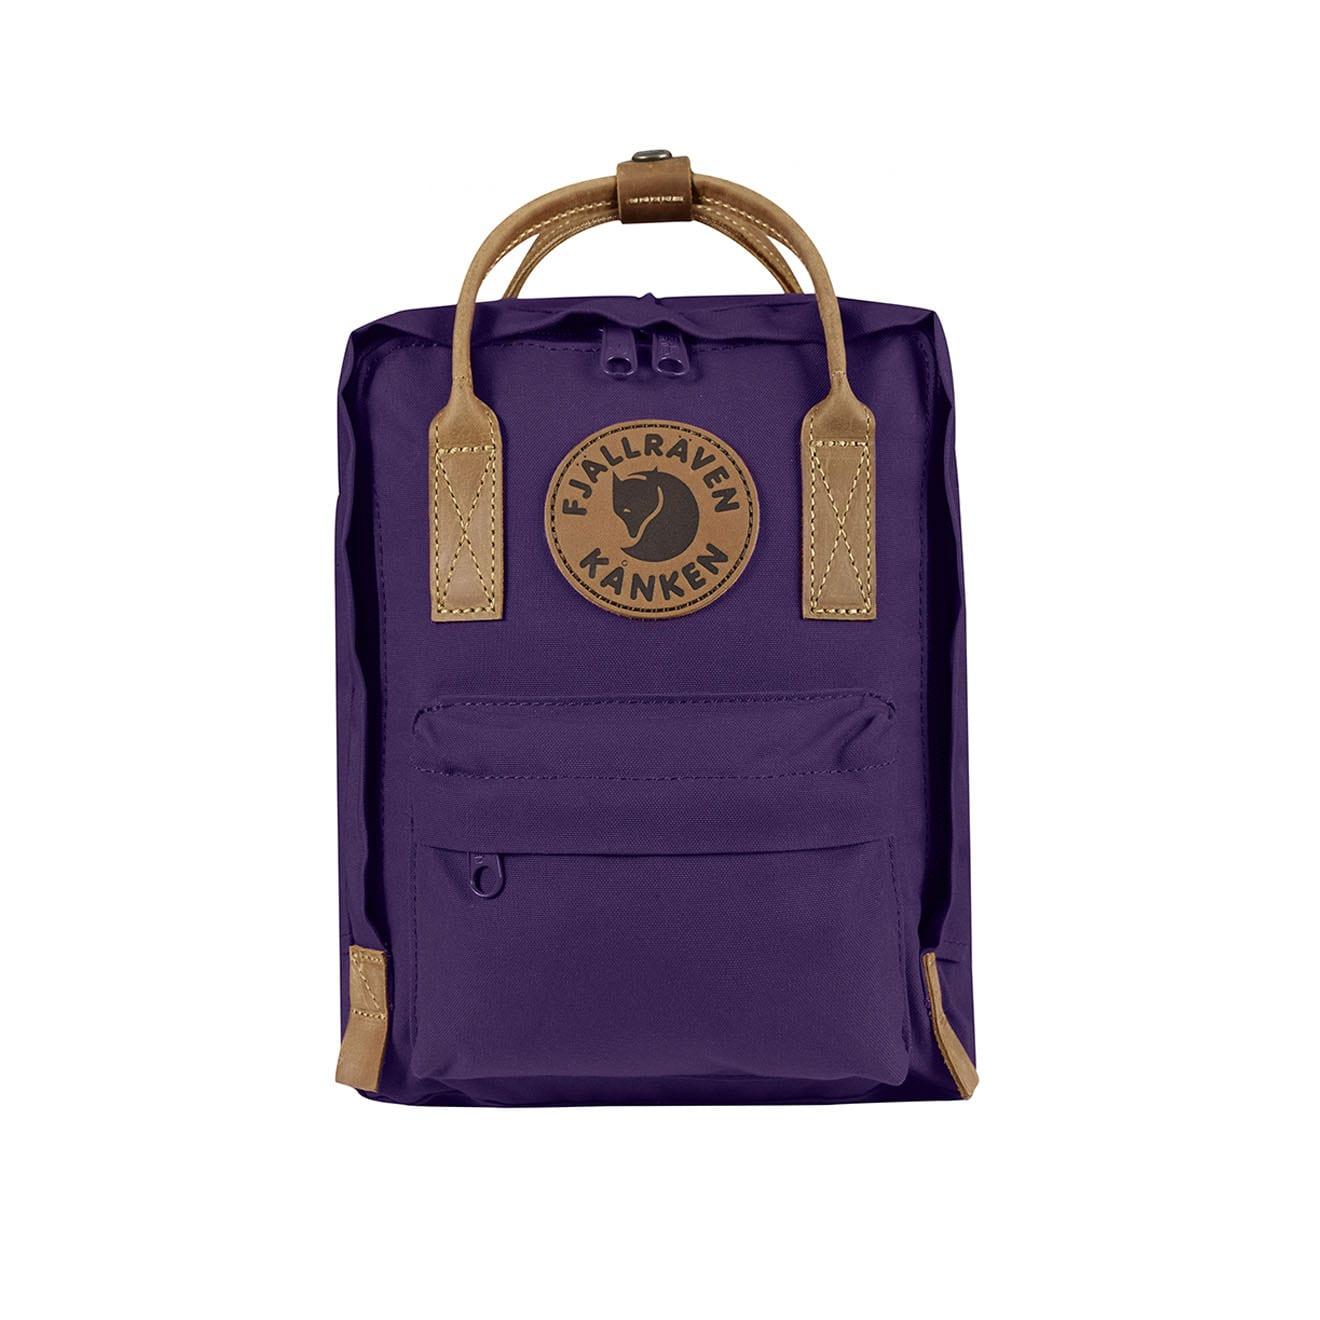 Fjallraven Mini No. 2 Kanken Alpine Purple - The Sporting Lodge f8b70d39496b7